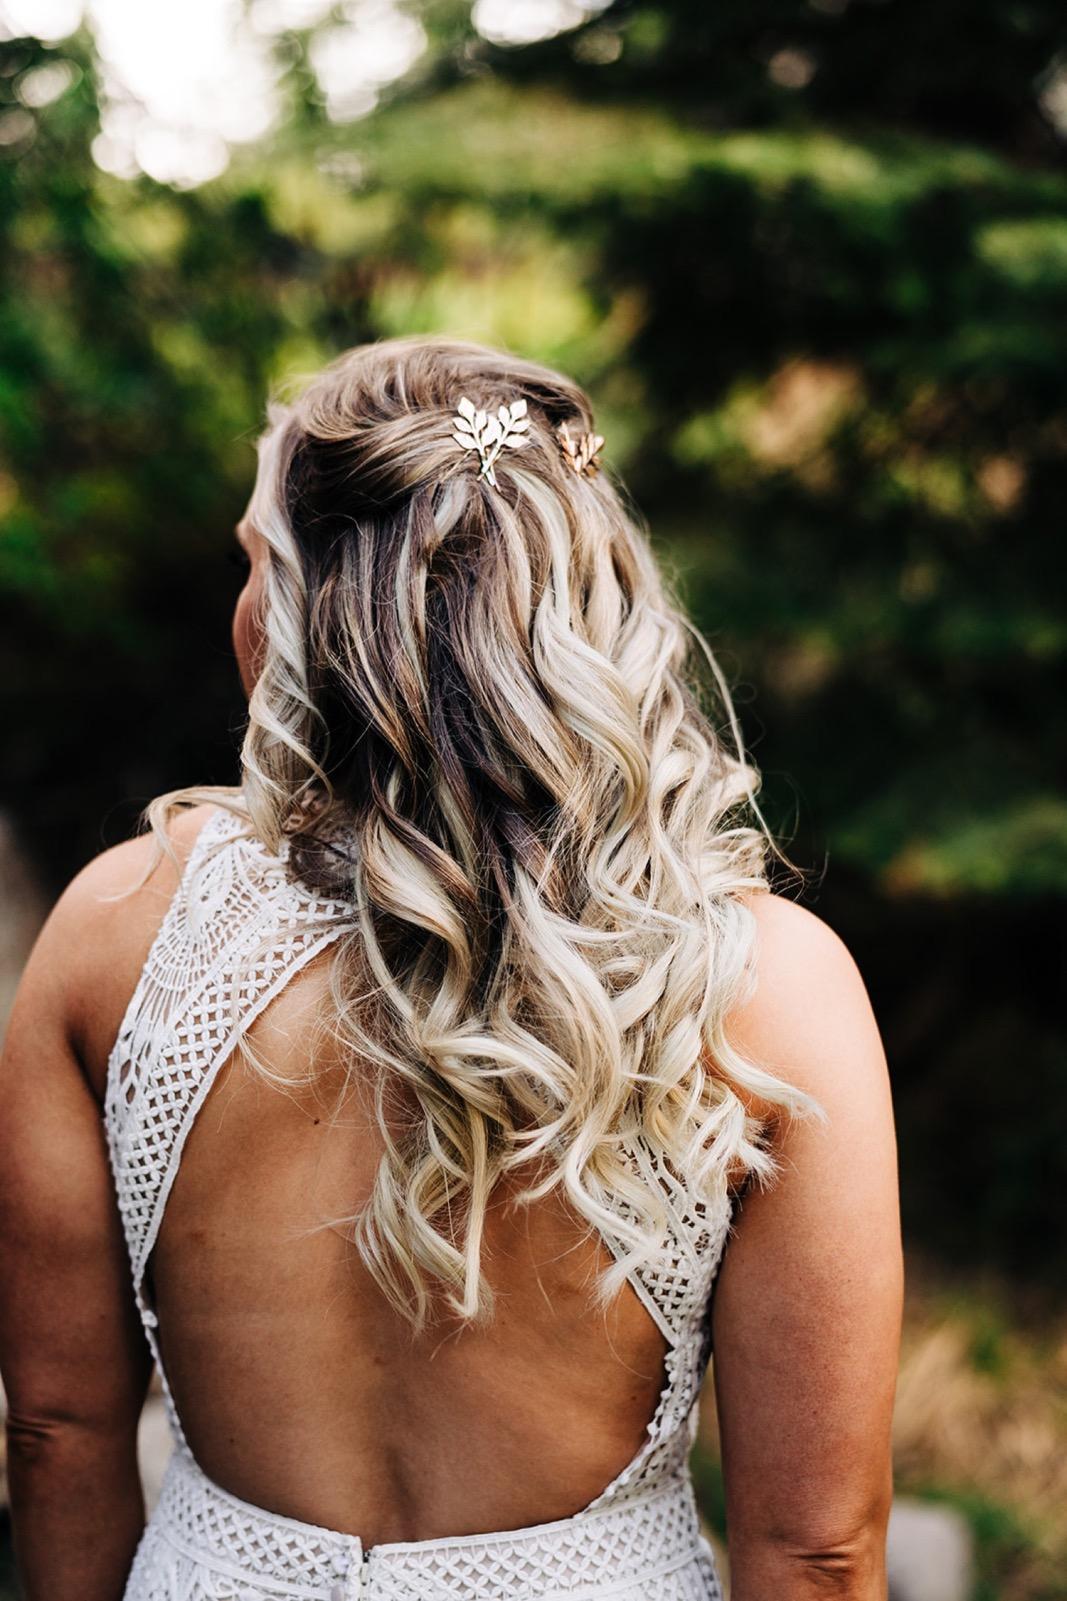 023_falissa_heather_wedding-53.jpg